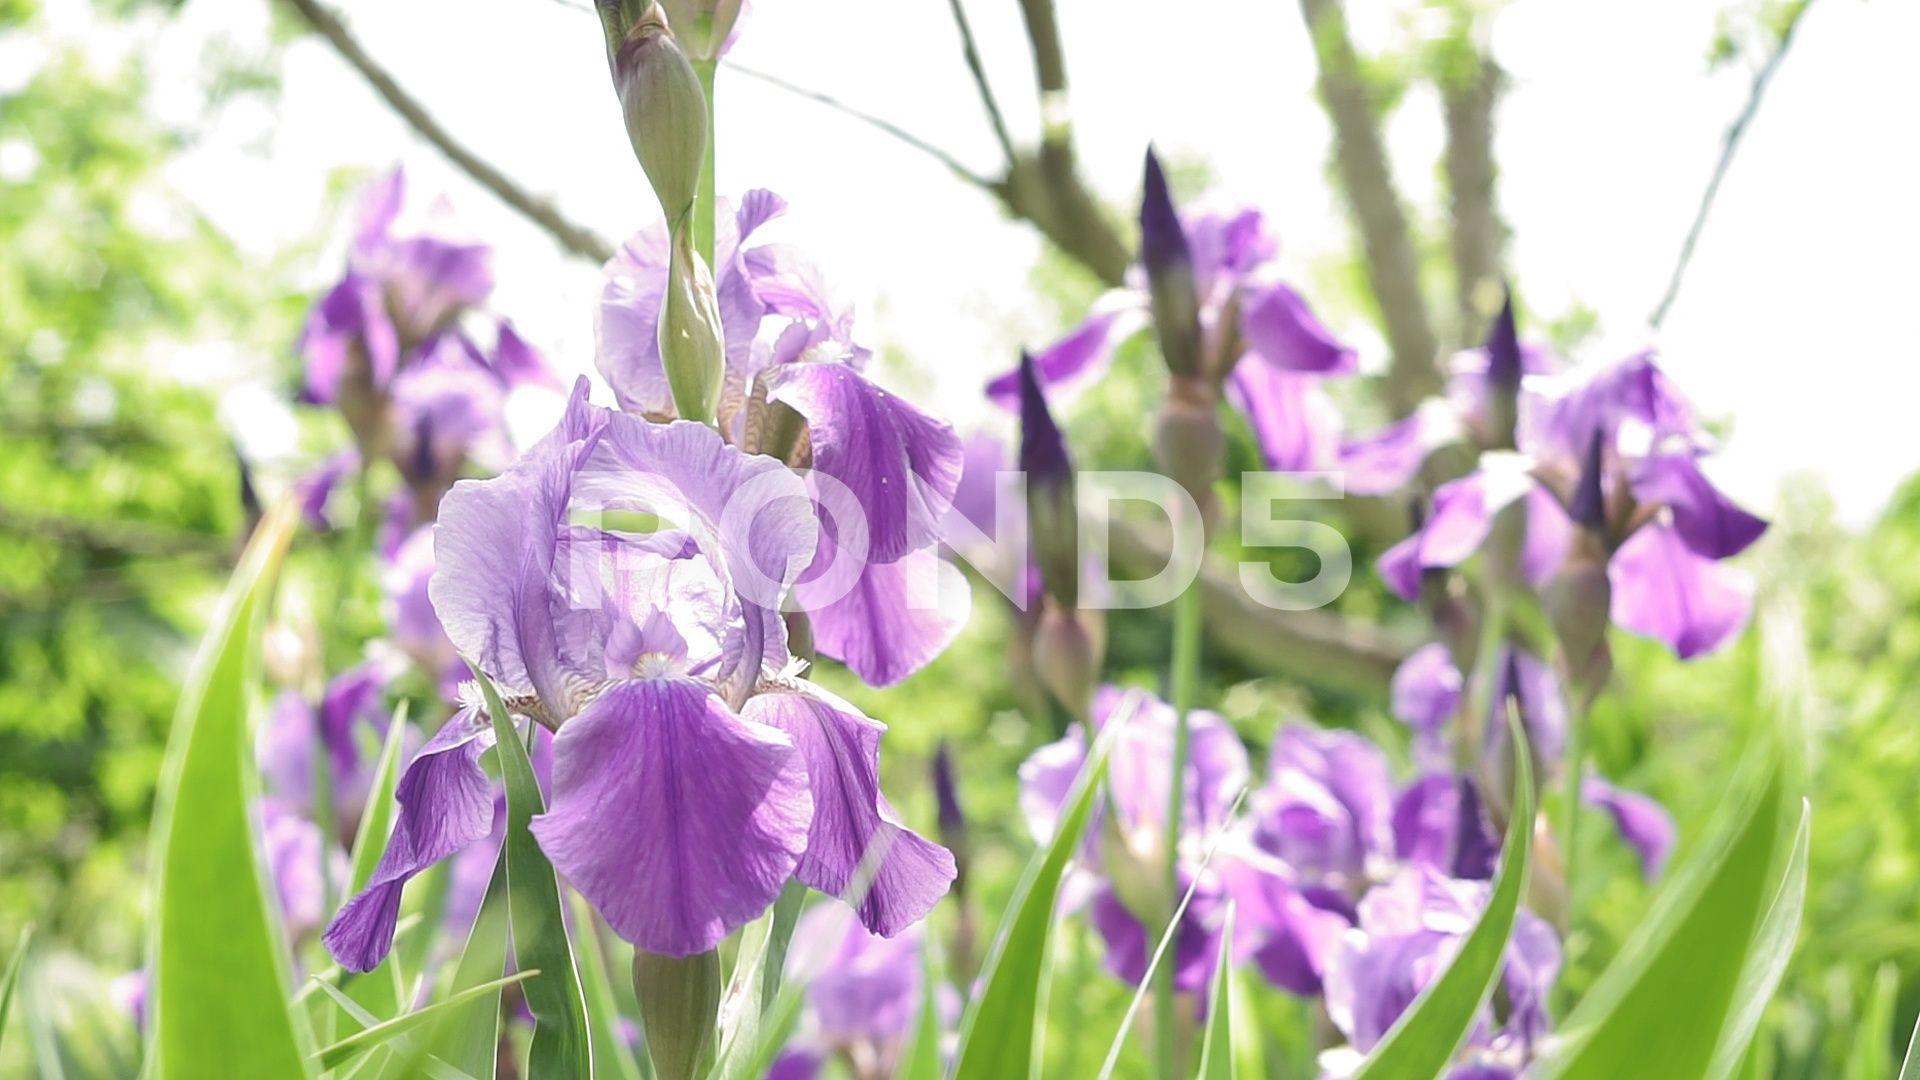 Purple Iris Flower In A Field Of Irises Nature Landscape Flora Beautiful Ad Field Irises Flower Purple In 2020 Iris Flowers Purple Iris Flower Field